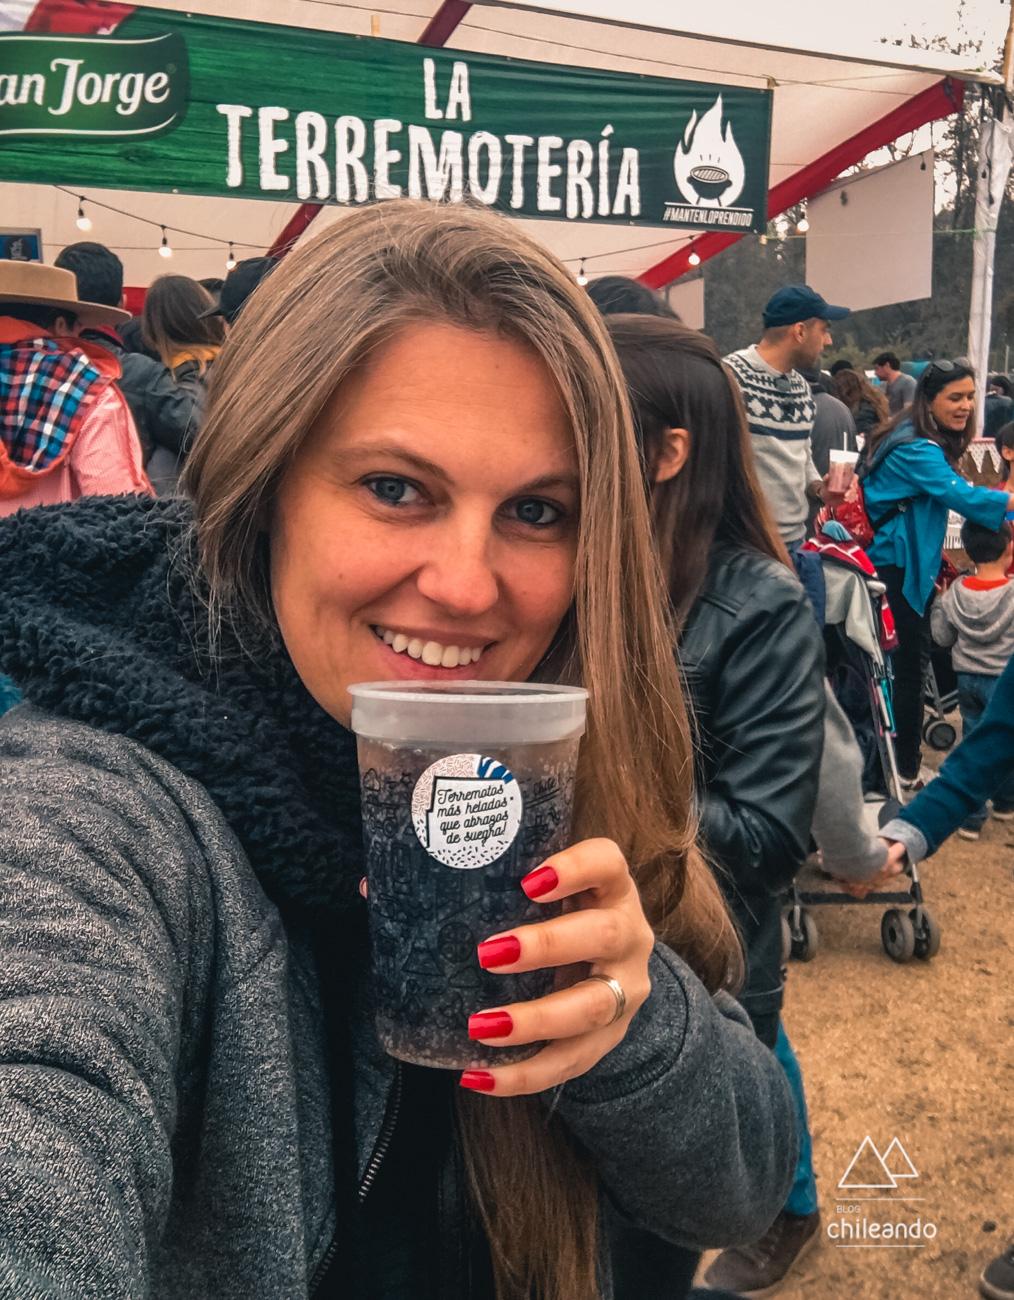 Provando Piscola durante as Festas Pátrias chilenas